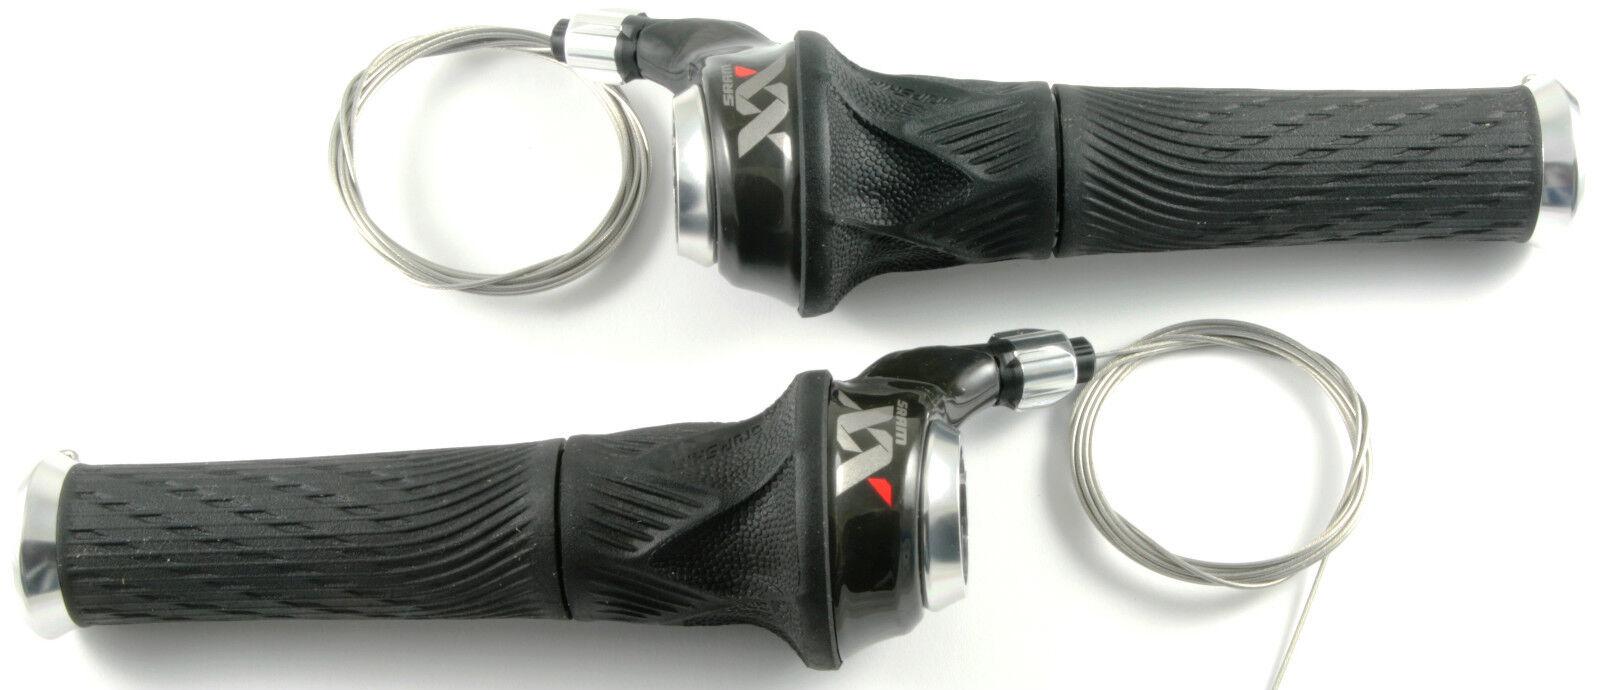 SRAM xx 2 & 10 Grip Shift palanca set 2013 desencadenadores x.x Twister shifter